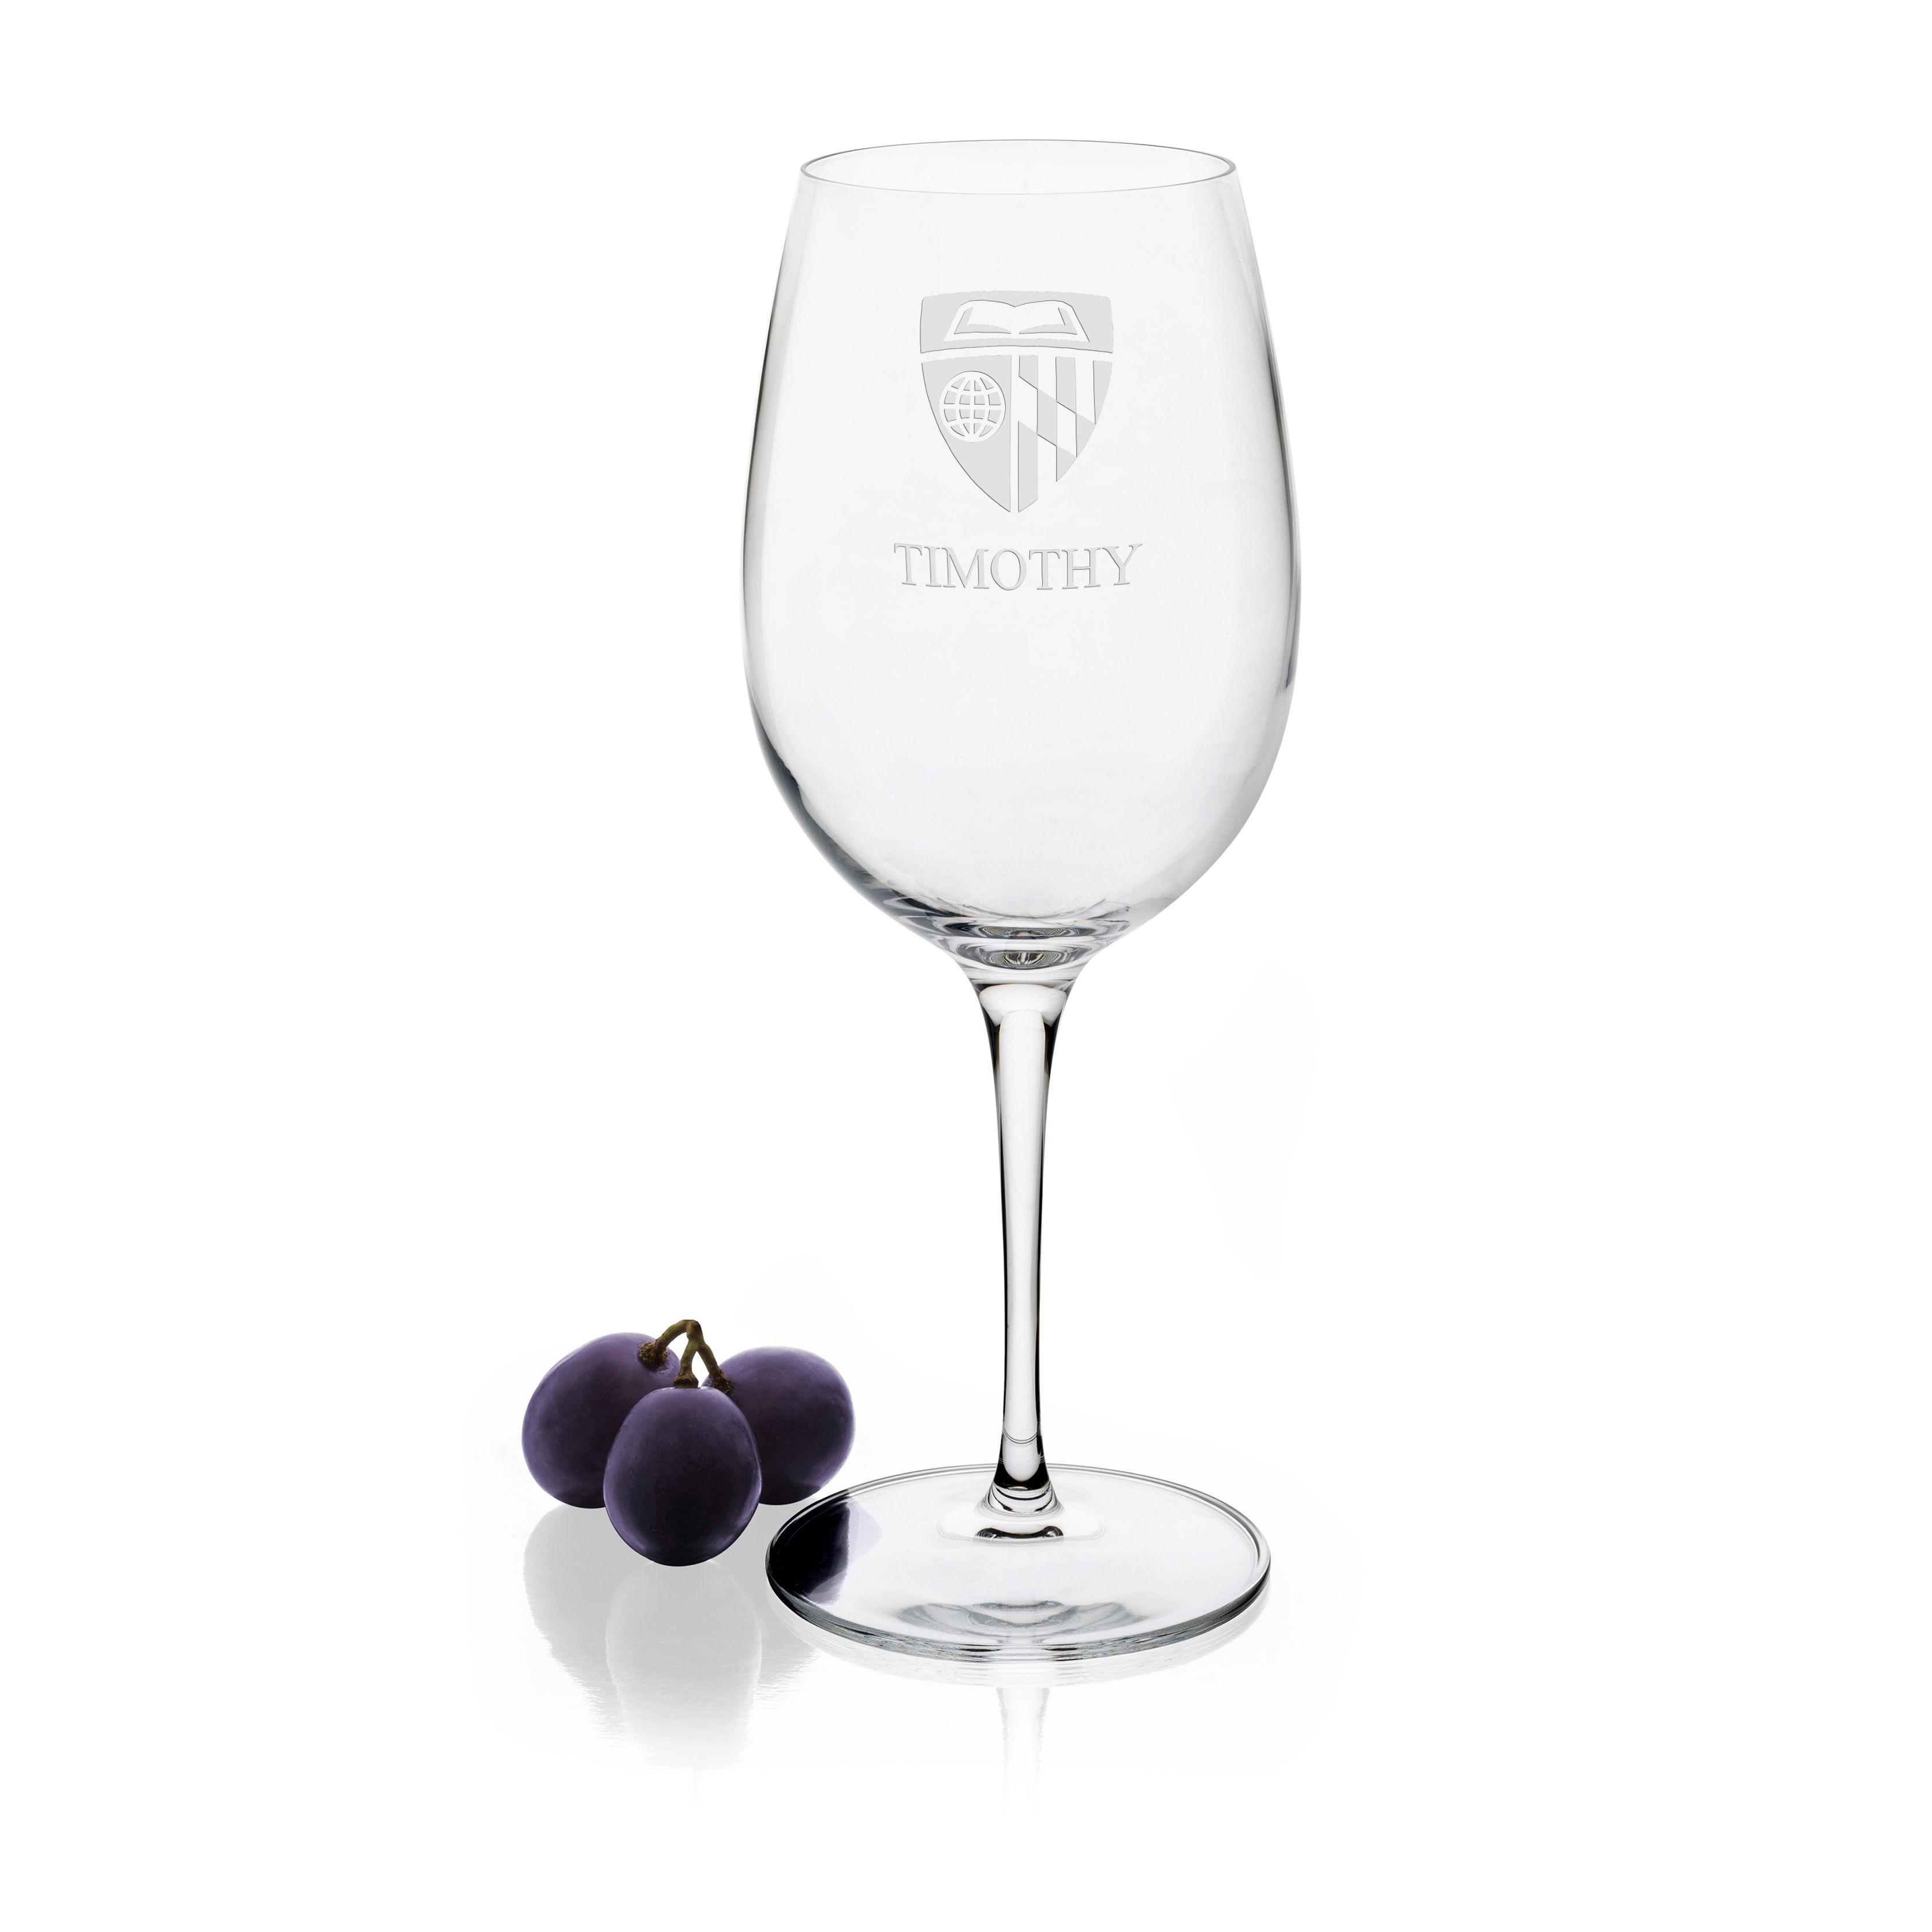 Johns Hopkins University Red Wine Glasses - Set of 2